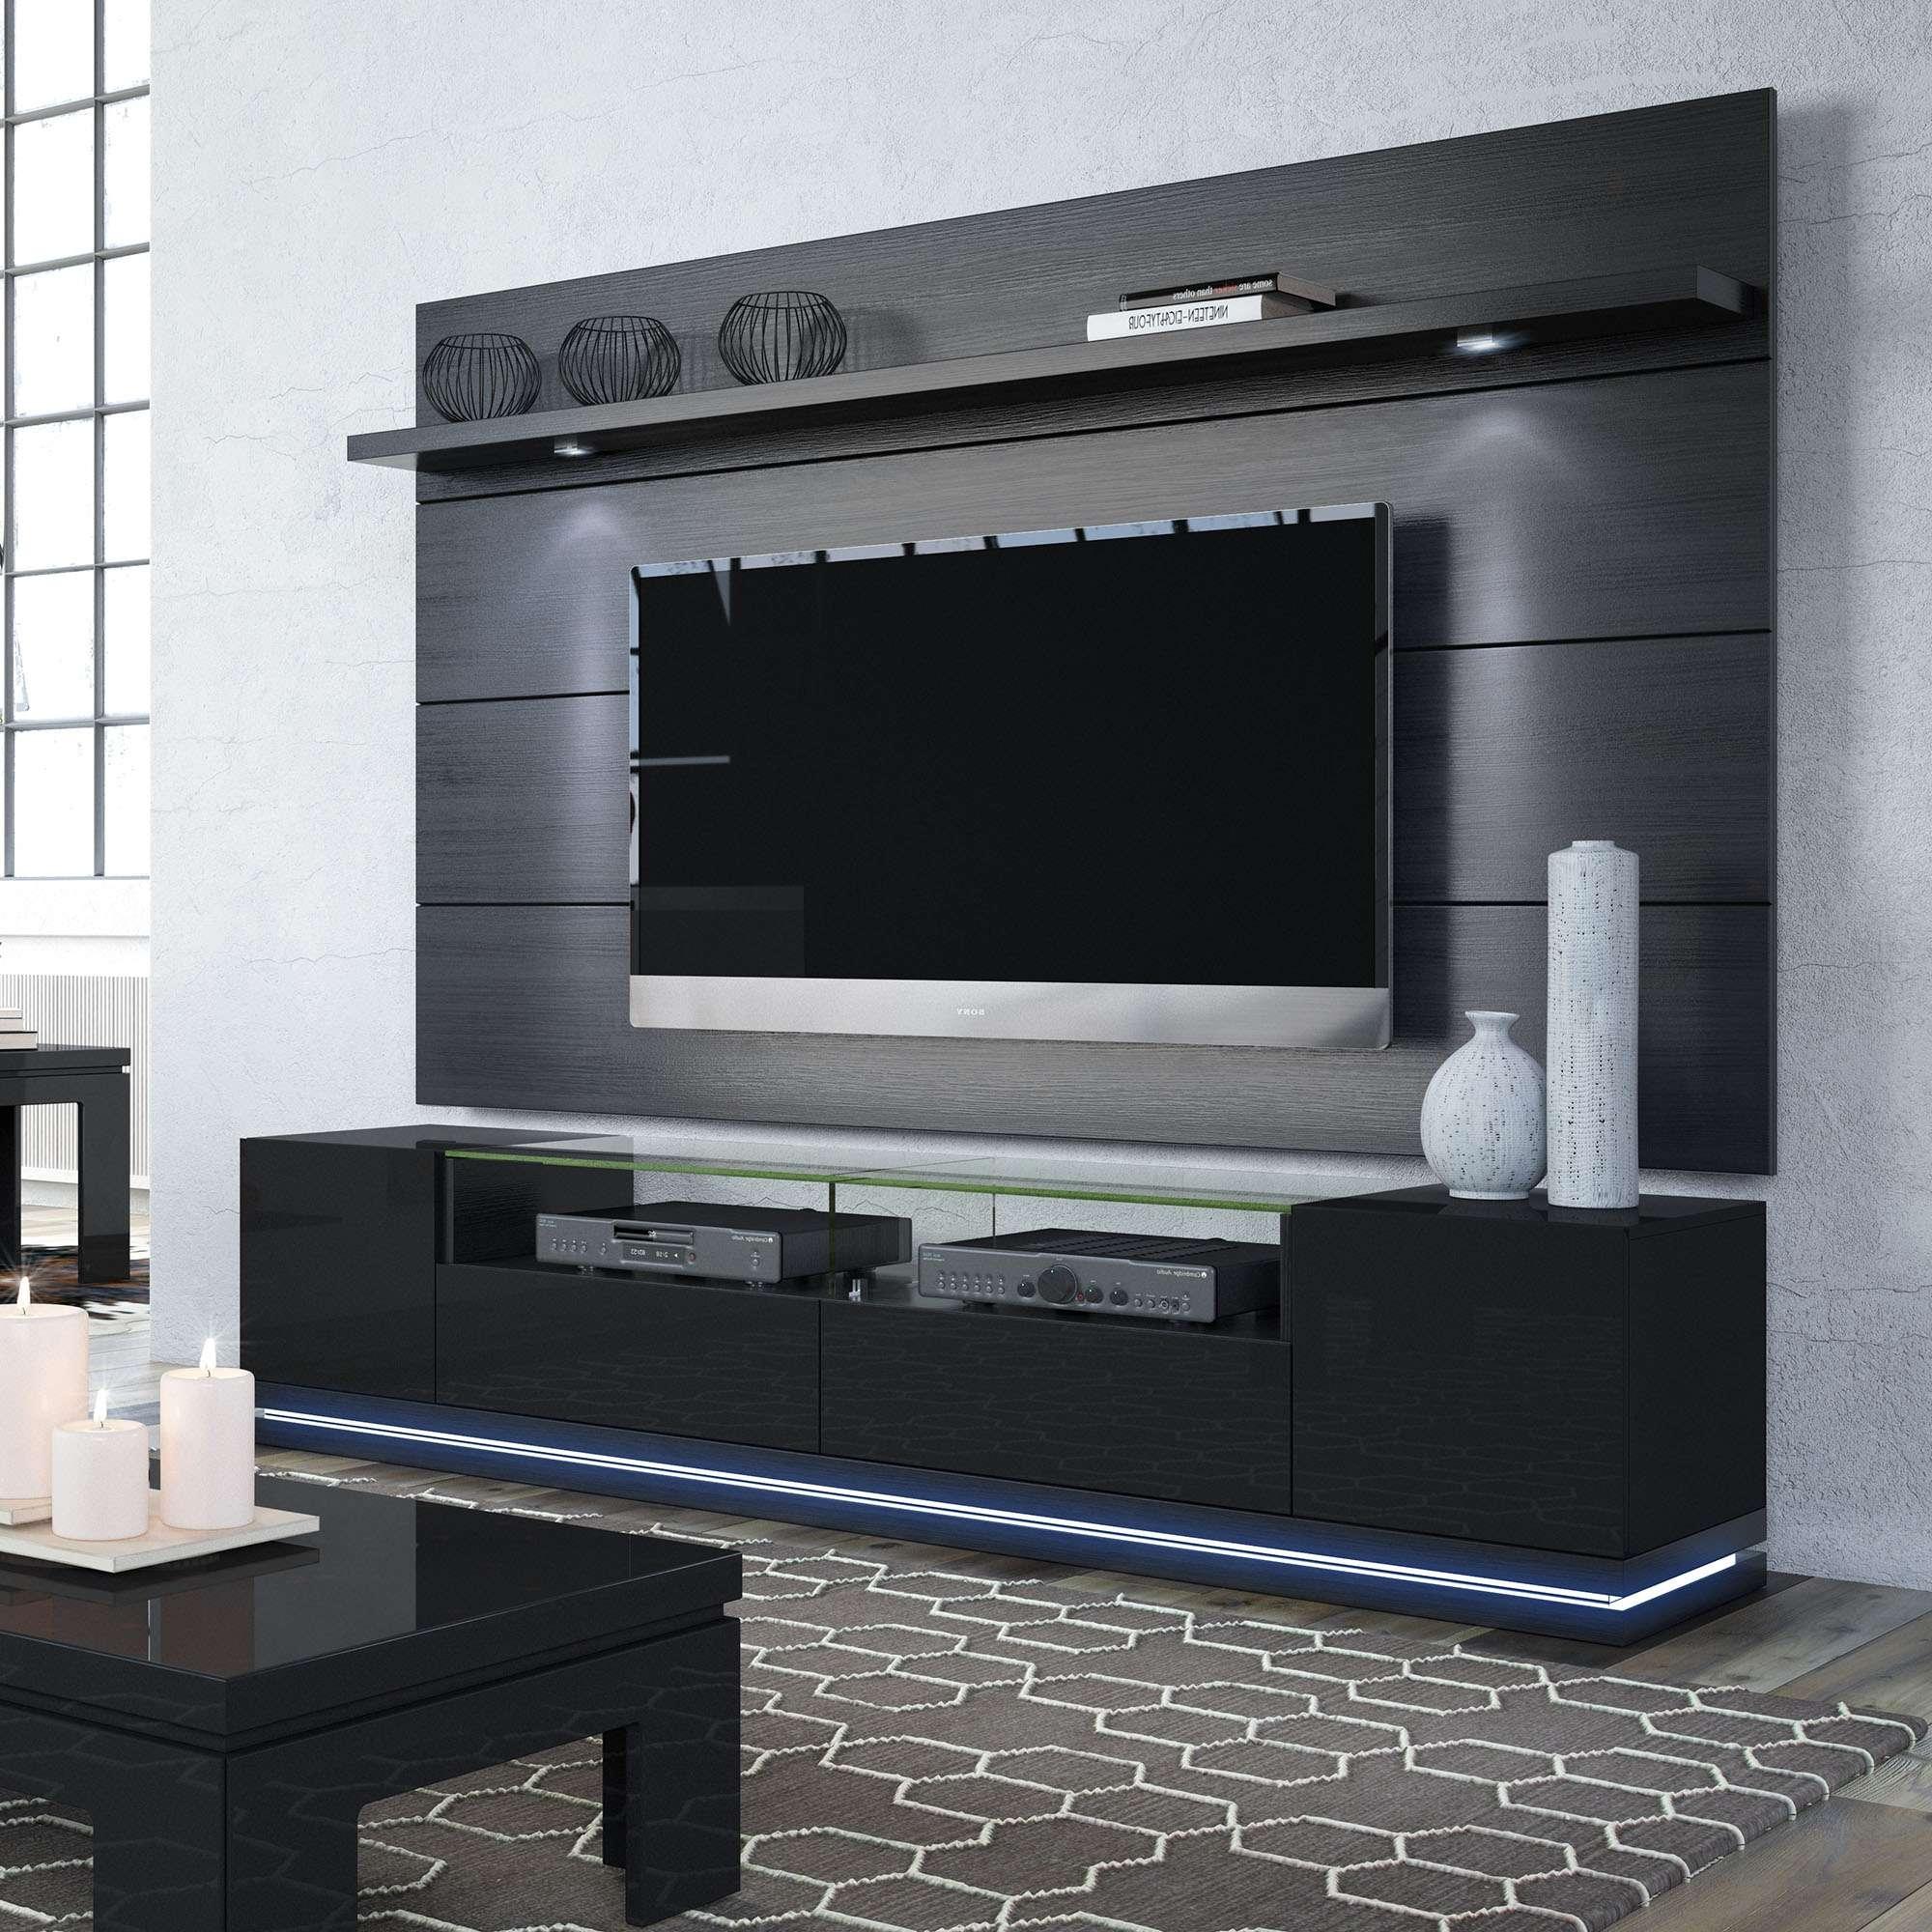 Vanderbilt Black Gloss & Black Matte Tv Stand & Cabrini (View 13 of 20)